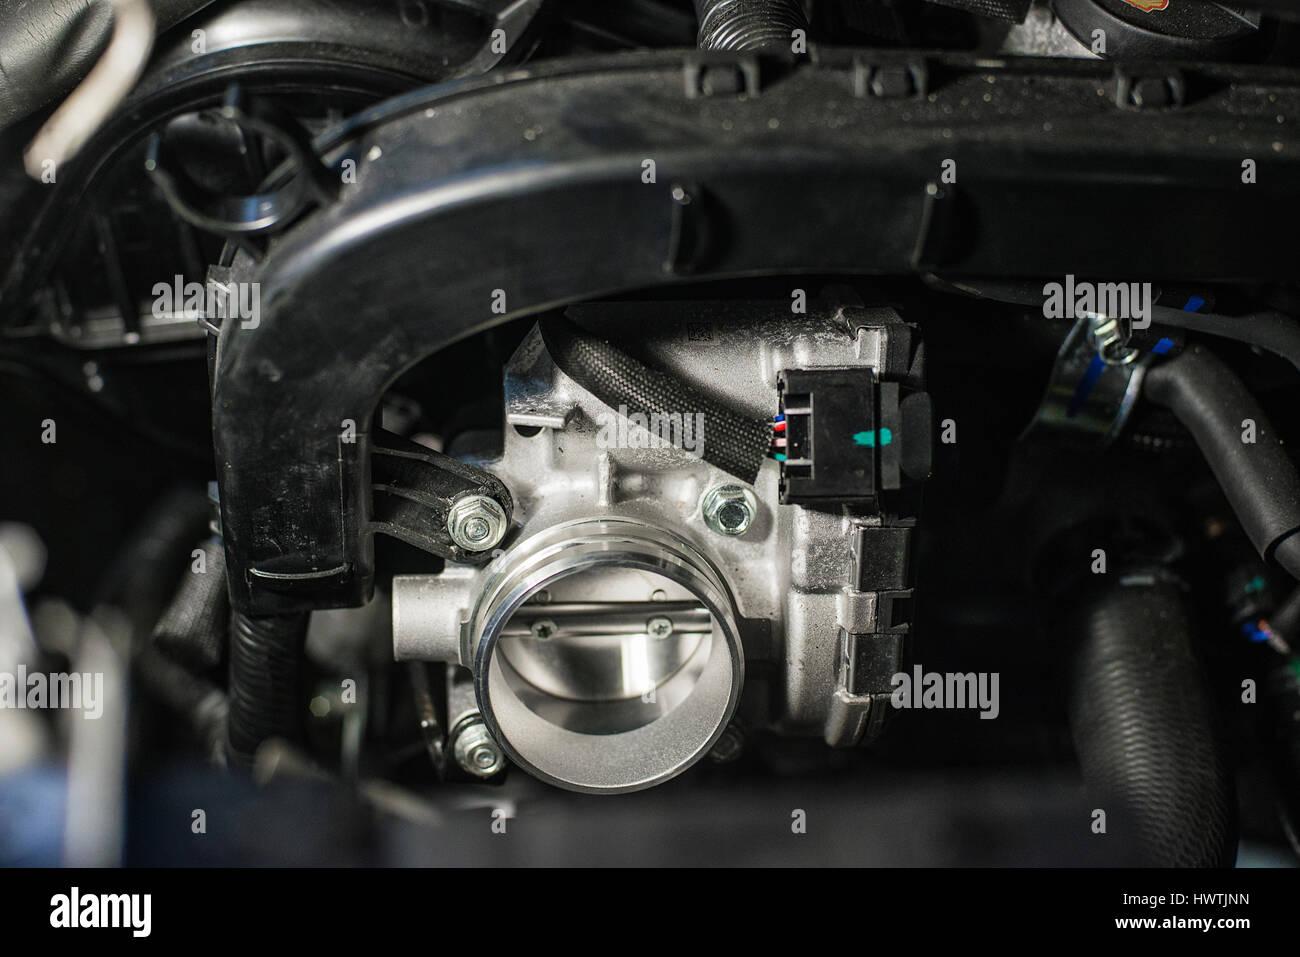 new vehicle throttle Stock Photo